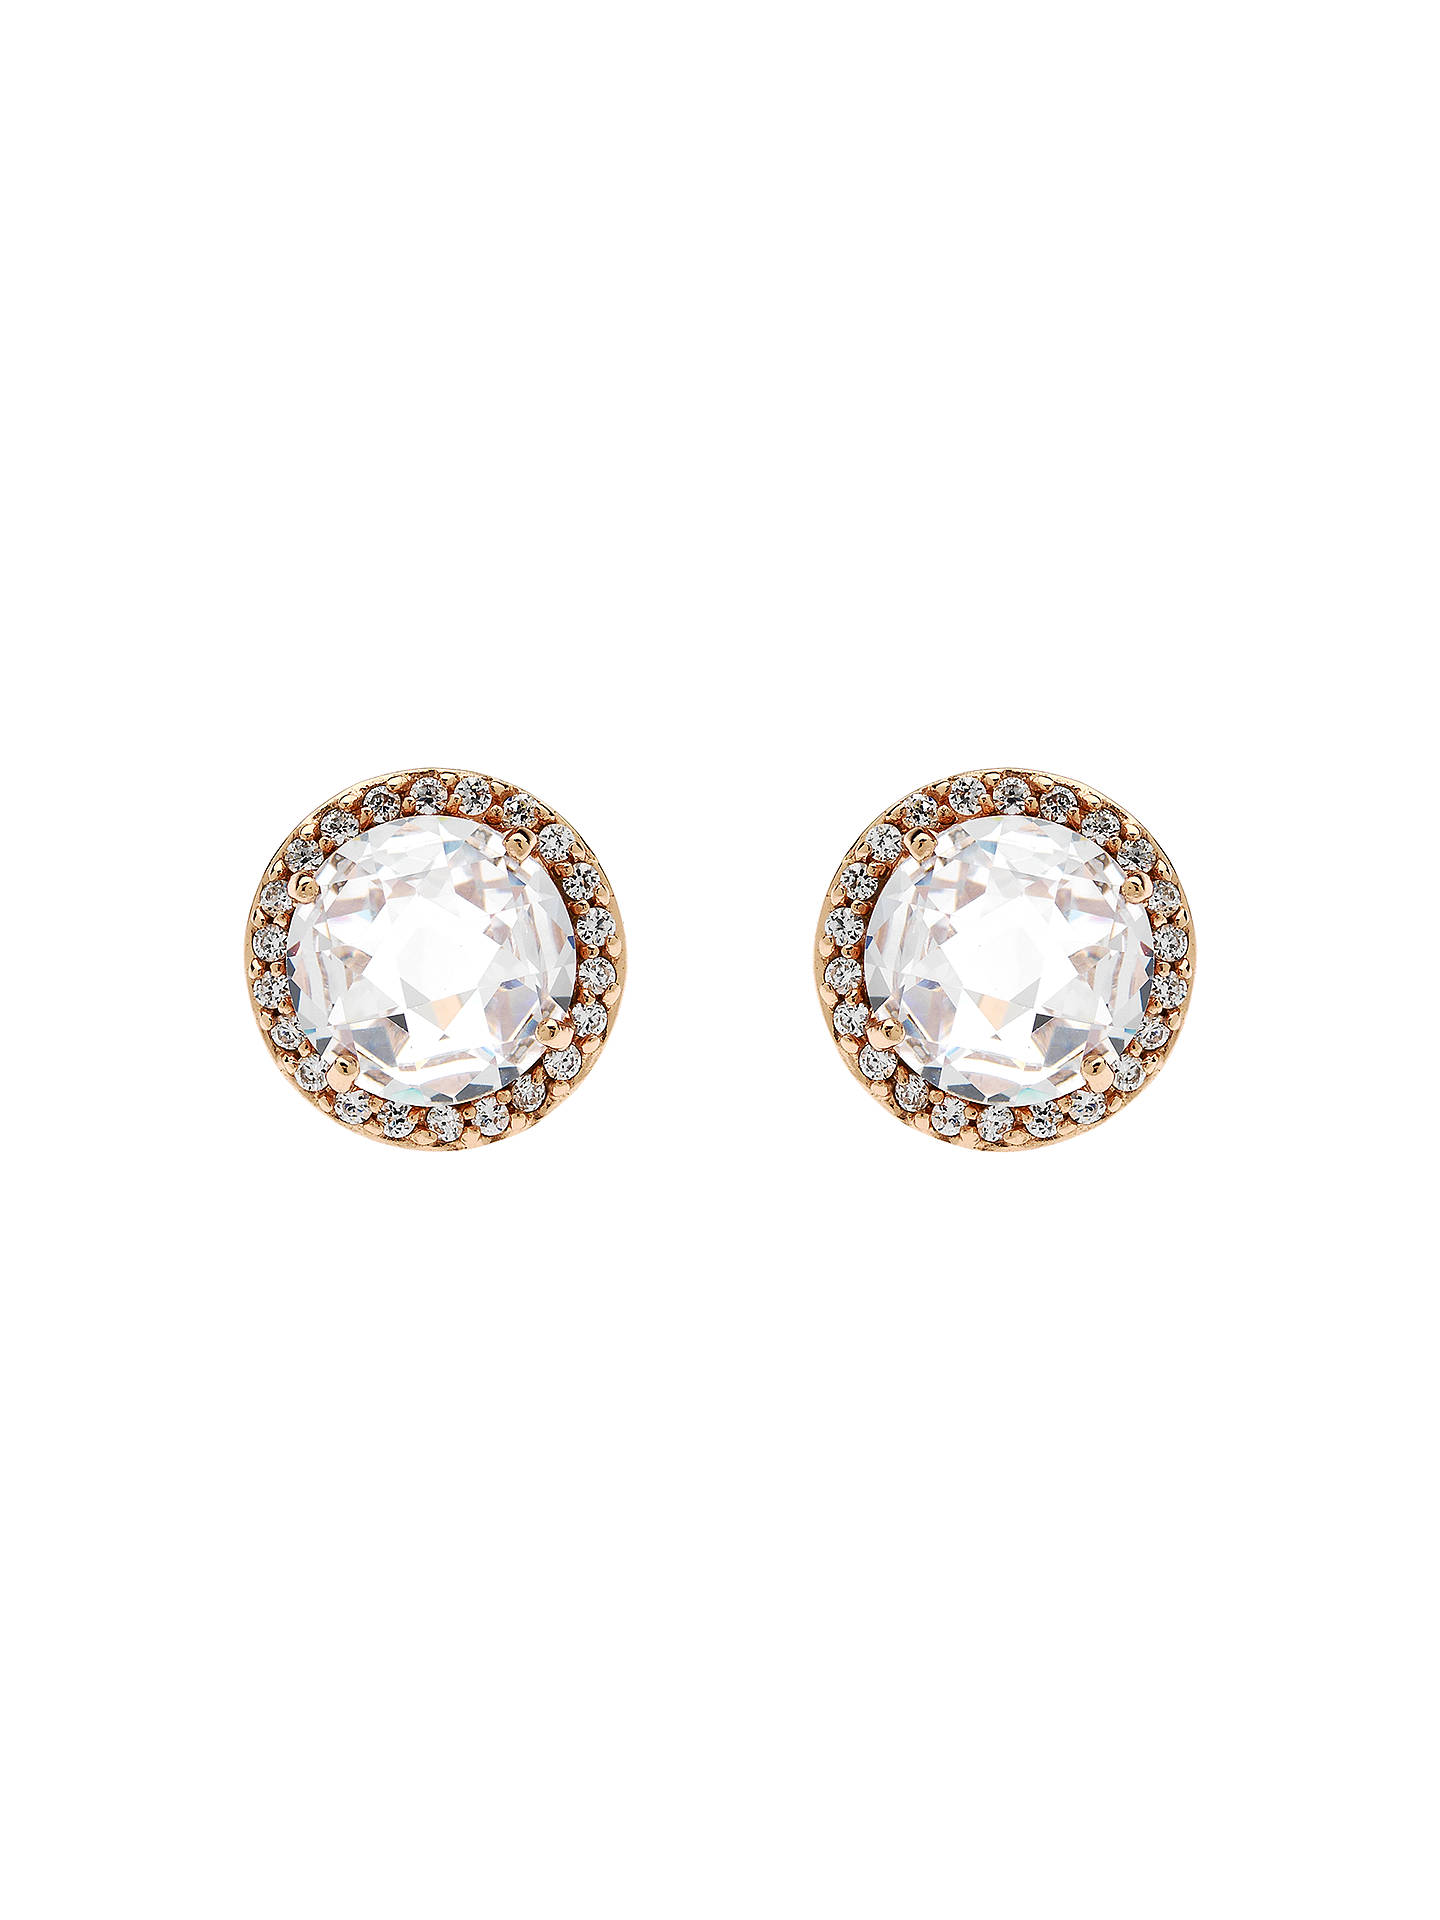 08f41fd2b Buy Jou Jou Sterling Silver Round Cubic Zirconia Stud Earrings, Rose Gold  Online at johnlewis ...